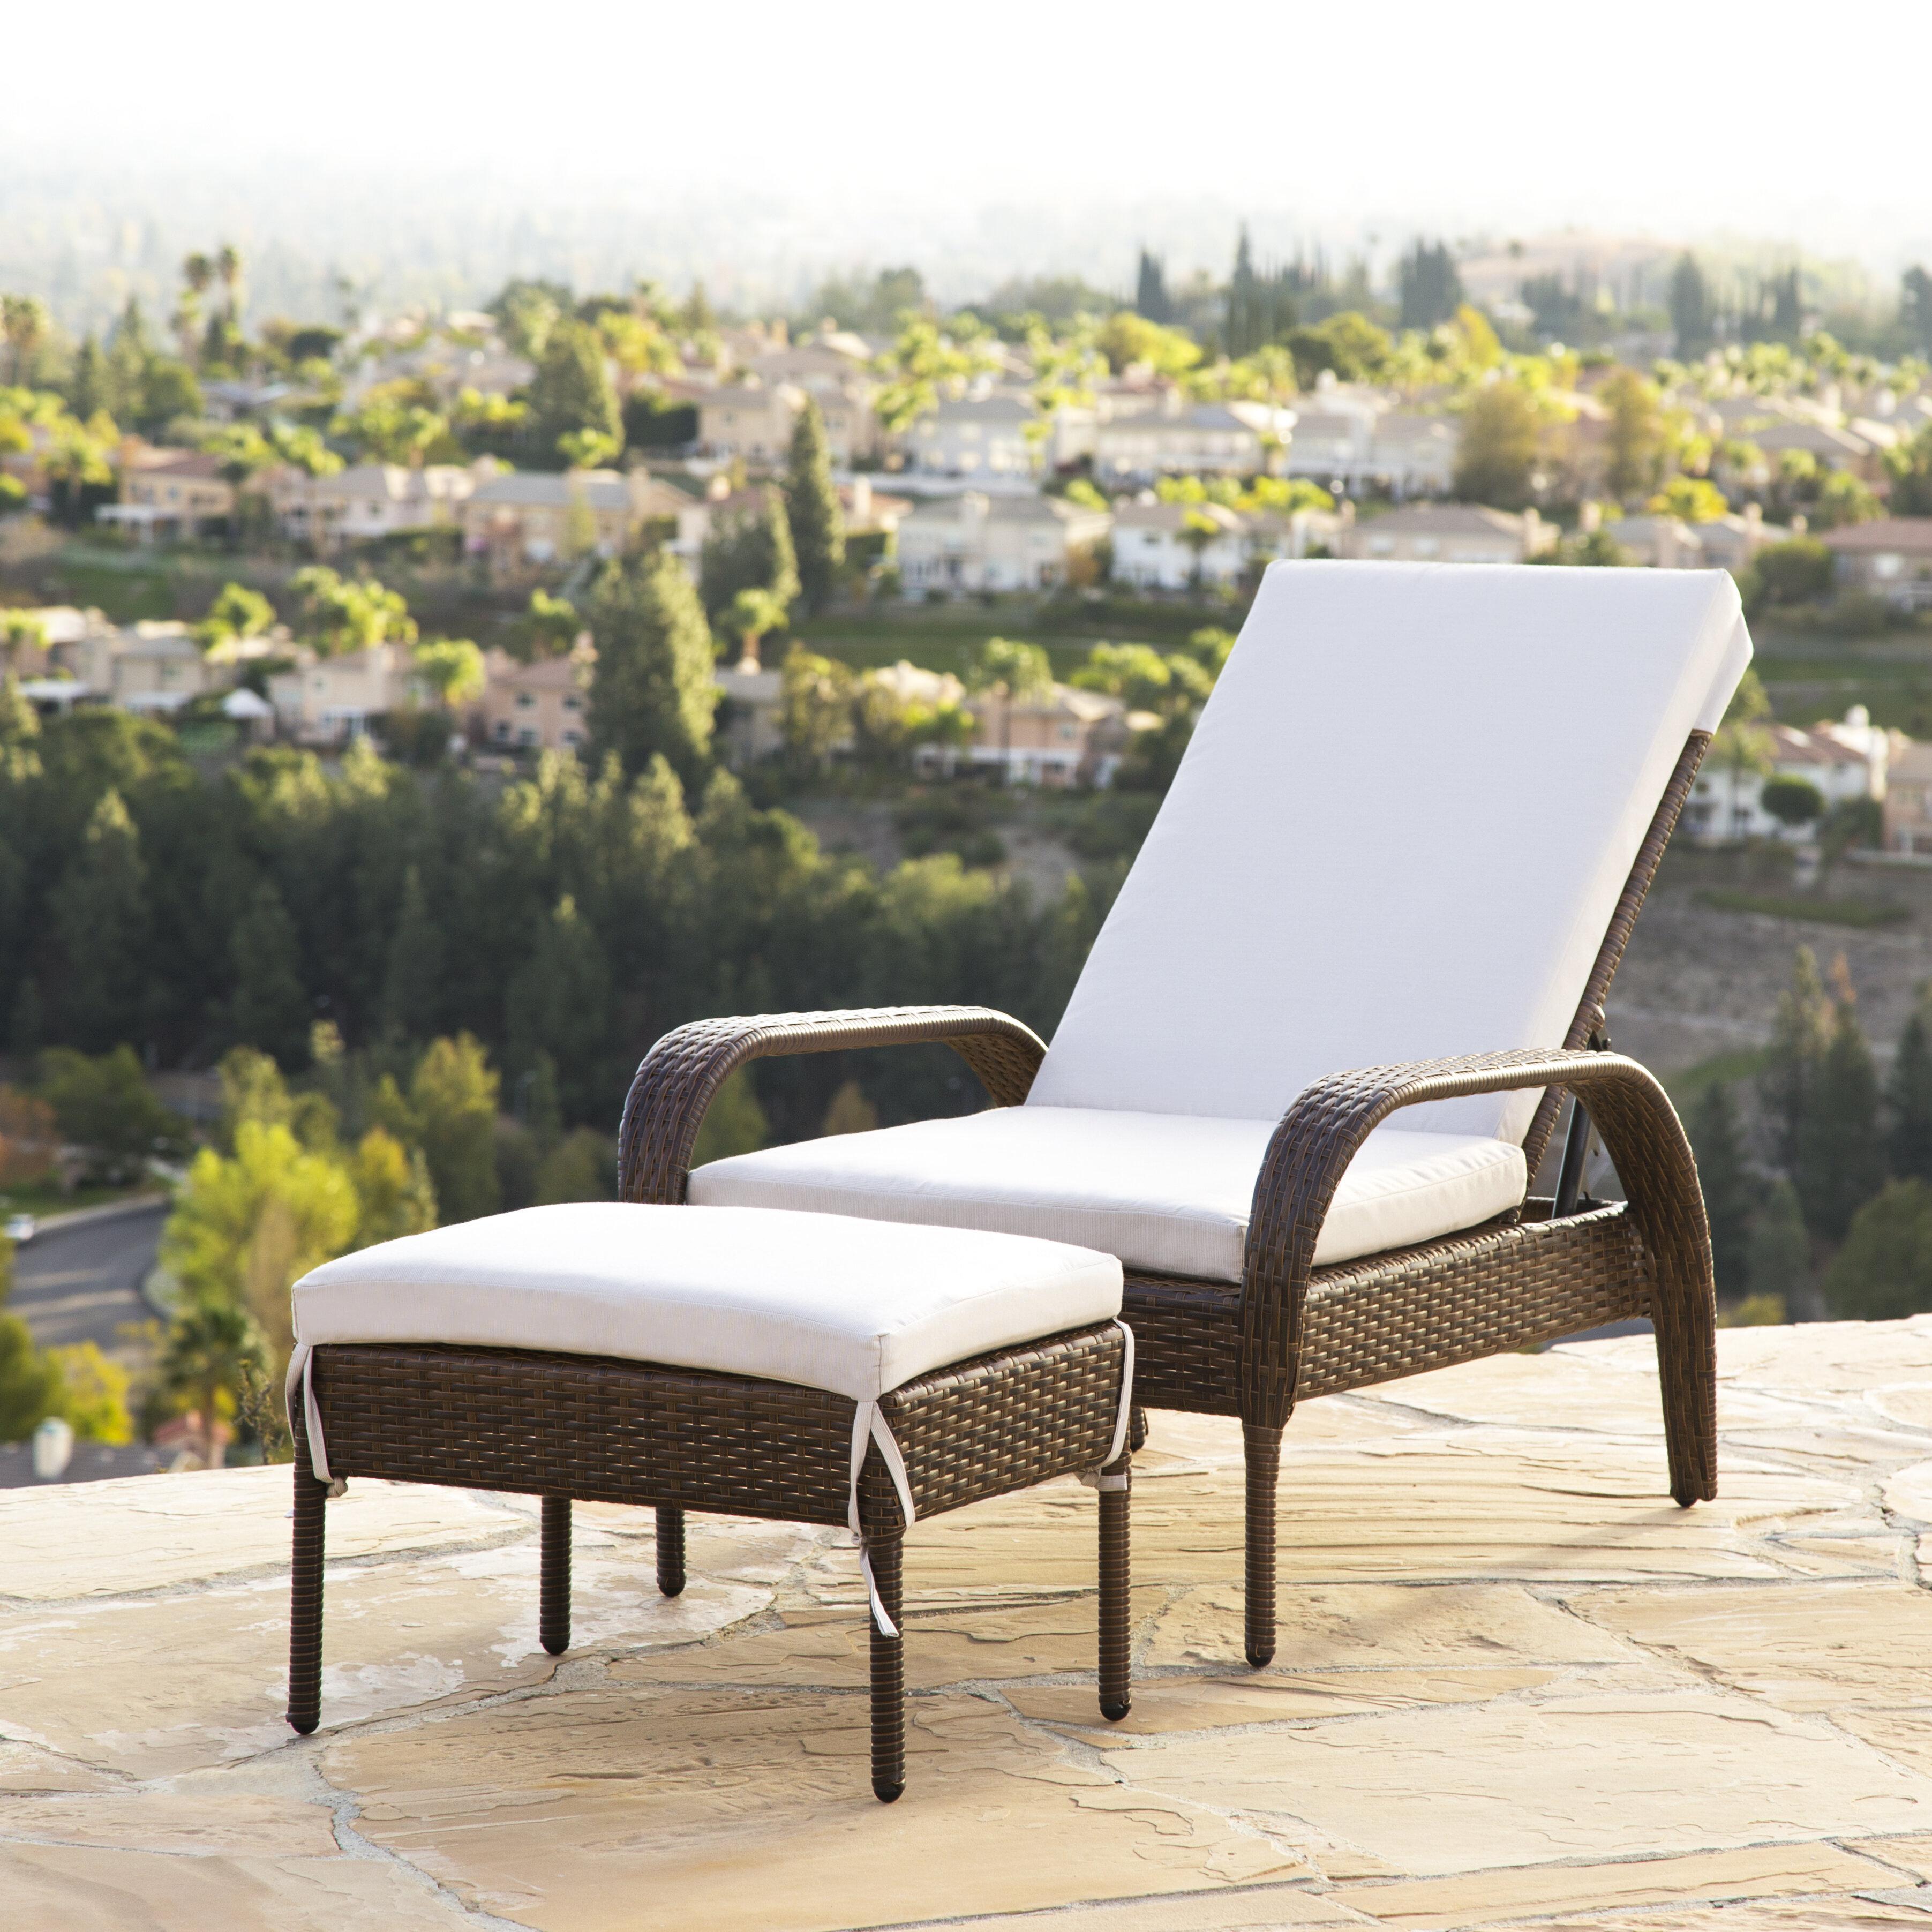 Wade logan banker patio chair with cushion reviews wayfair